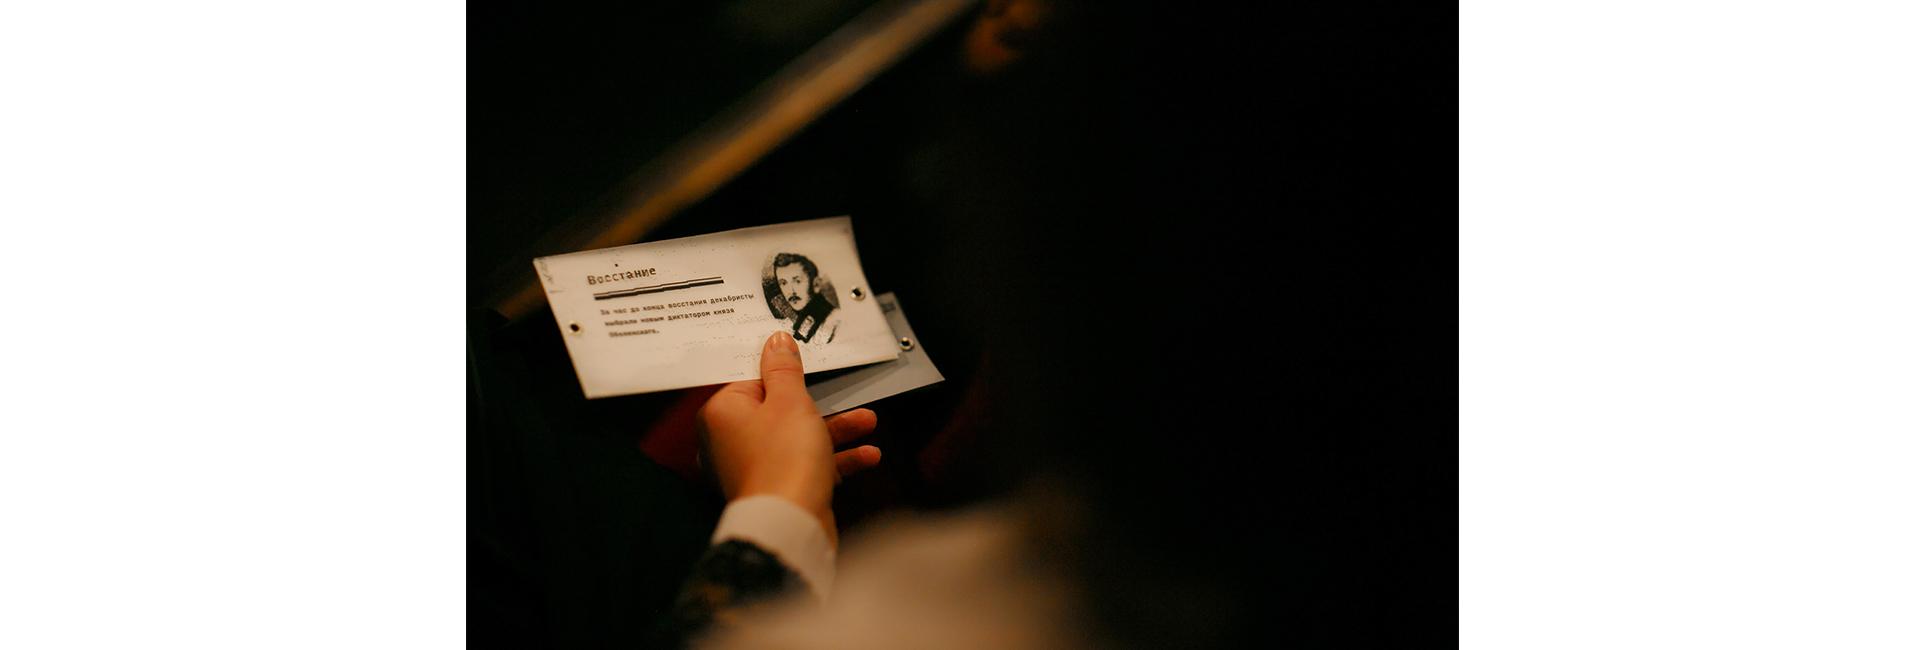 Спектакль-ужин «Декабристы»: суд над Трубецким за коктейлем «Эшафот» (фото 1)